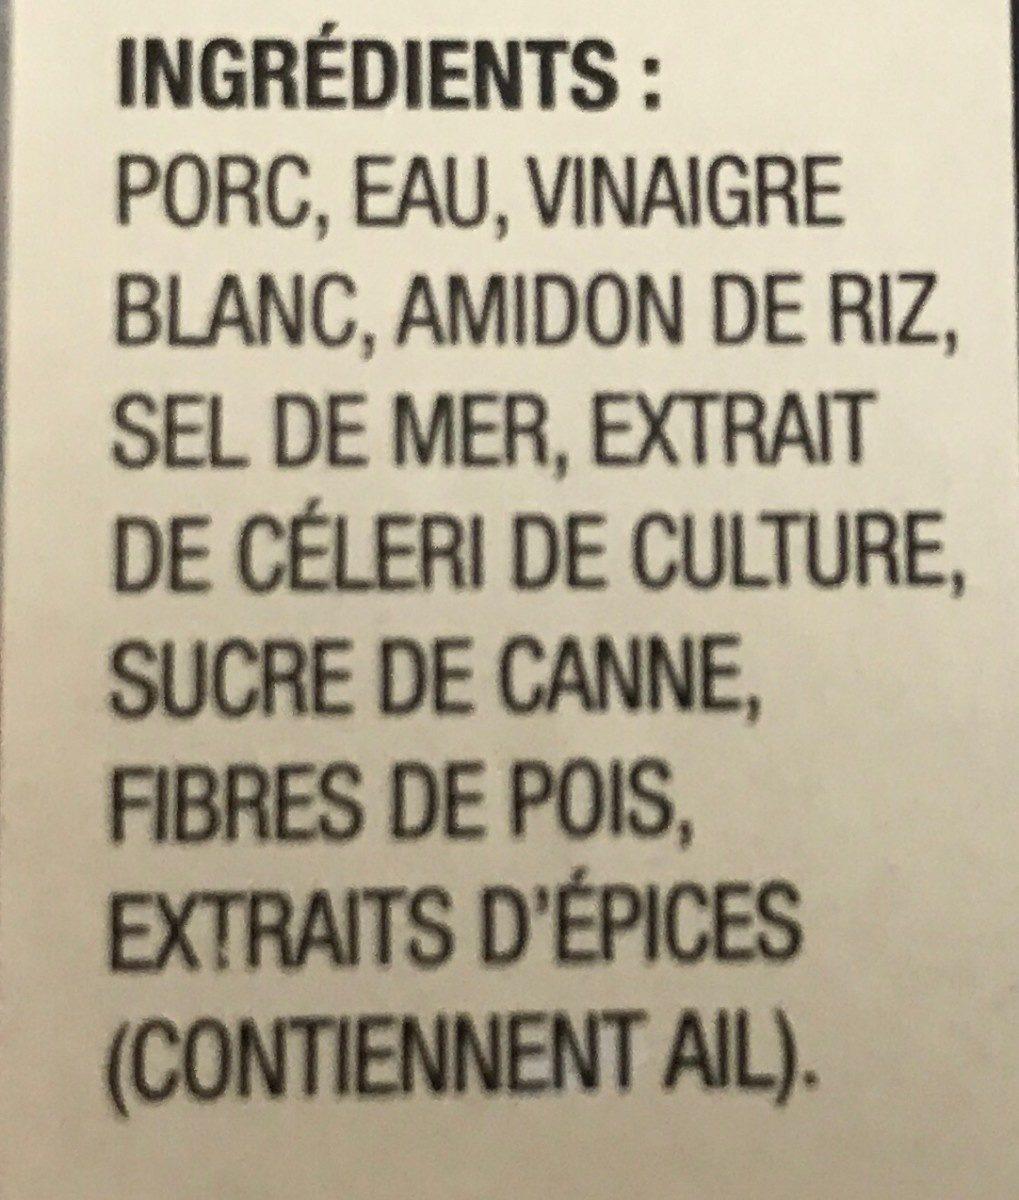 Extra lean stone roasted ham - Ingredients - fr